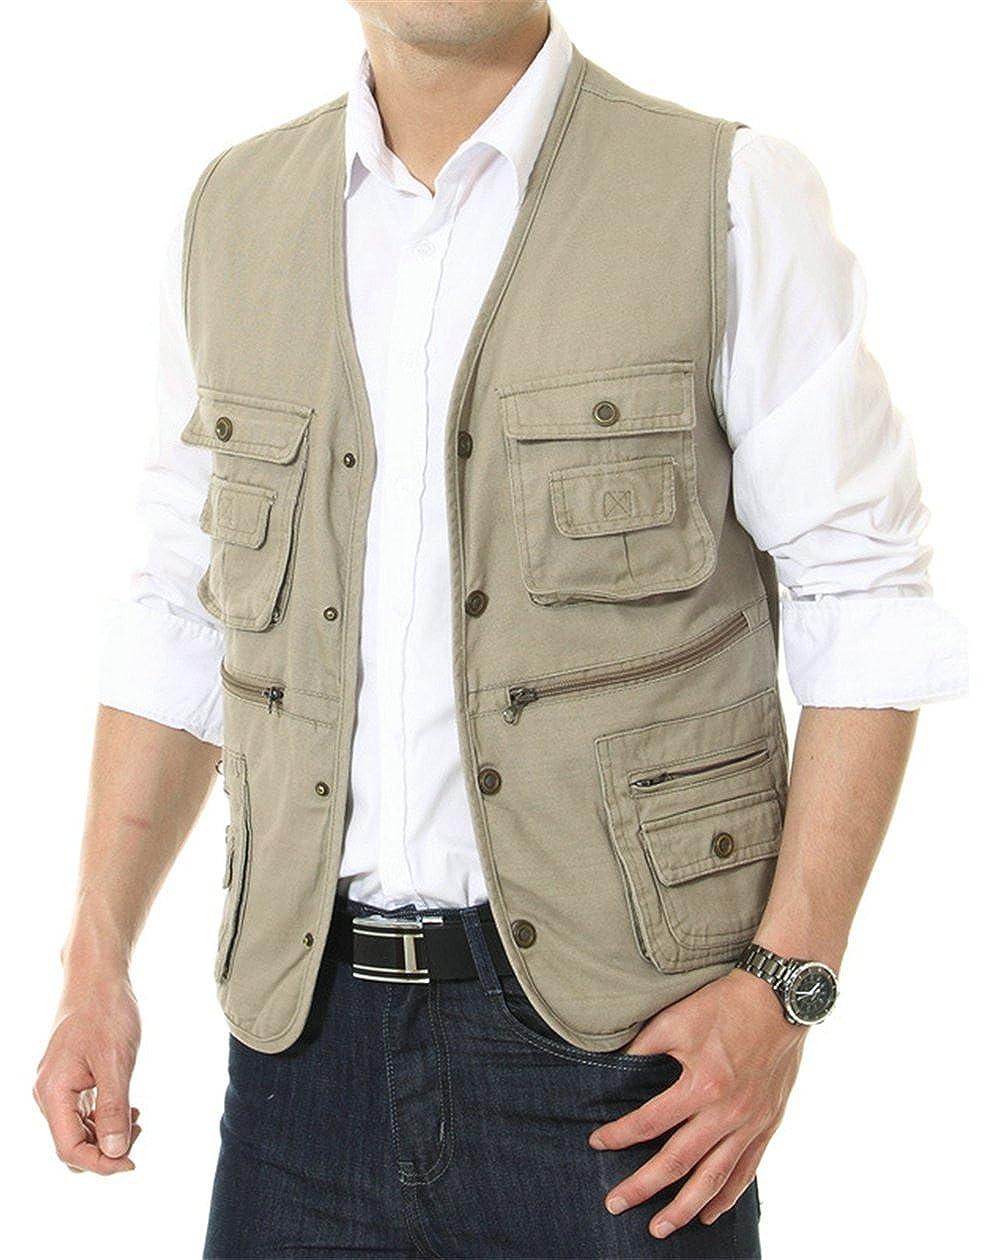 APTRO Men's Multi-Pocket Lightweight Safari Utility Fishing Photography Vest CANVX000001P